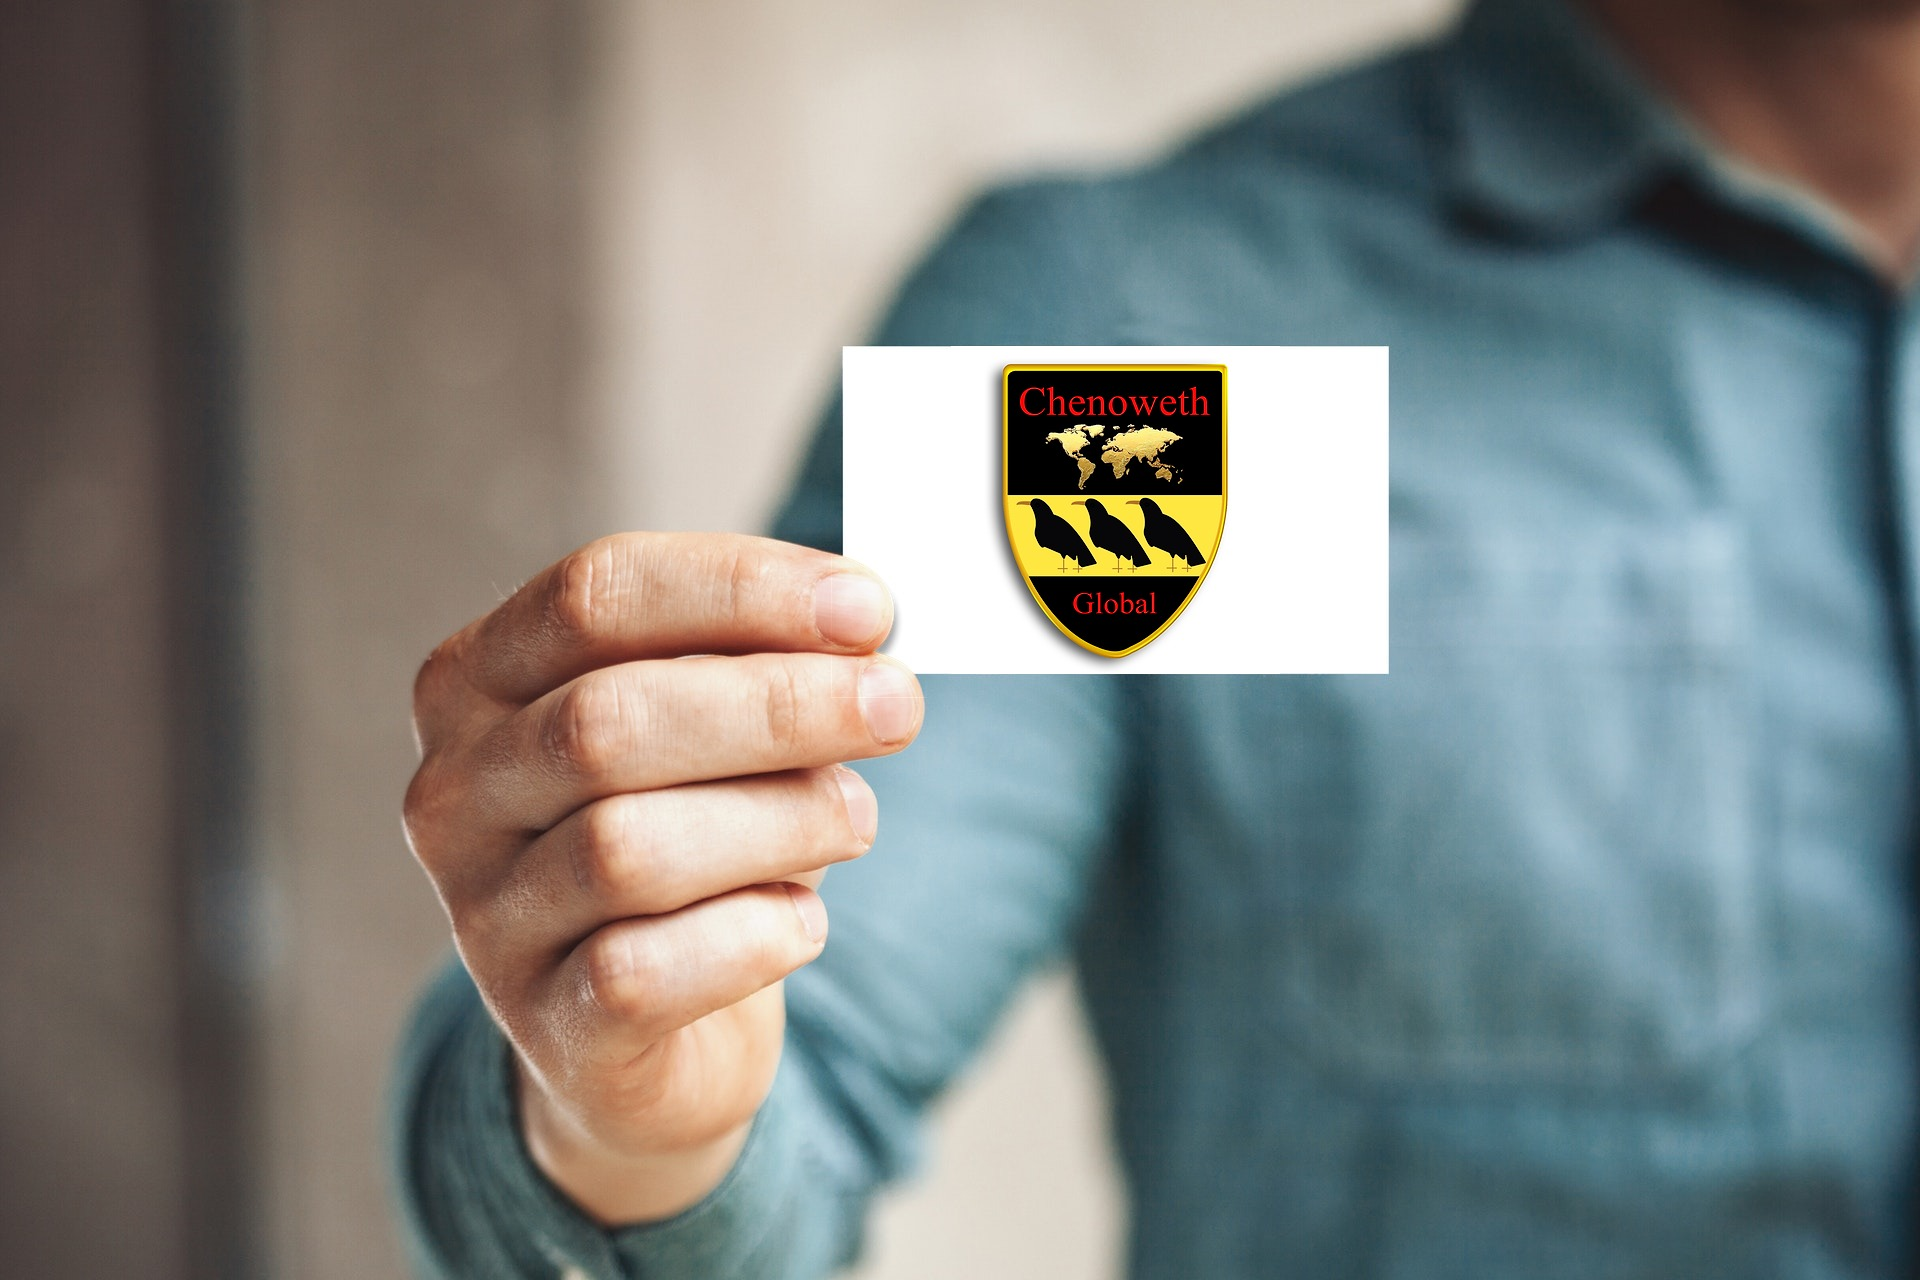 Chenoweth Global Business Card